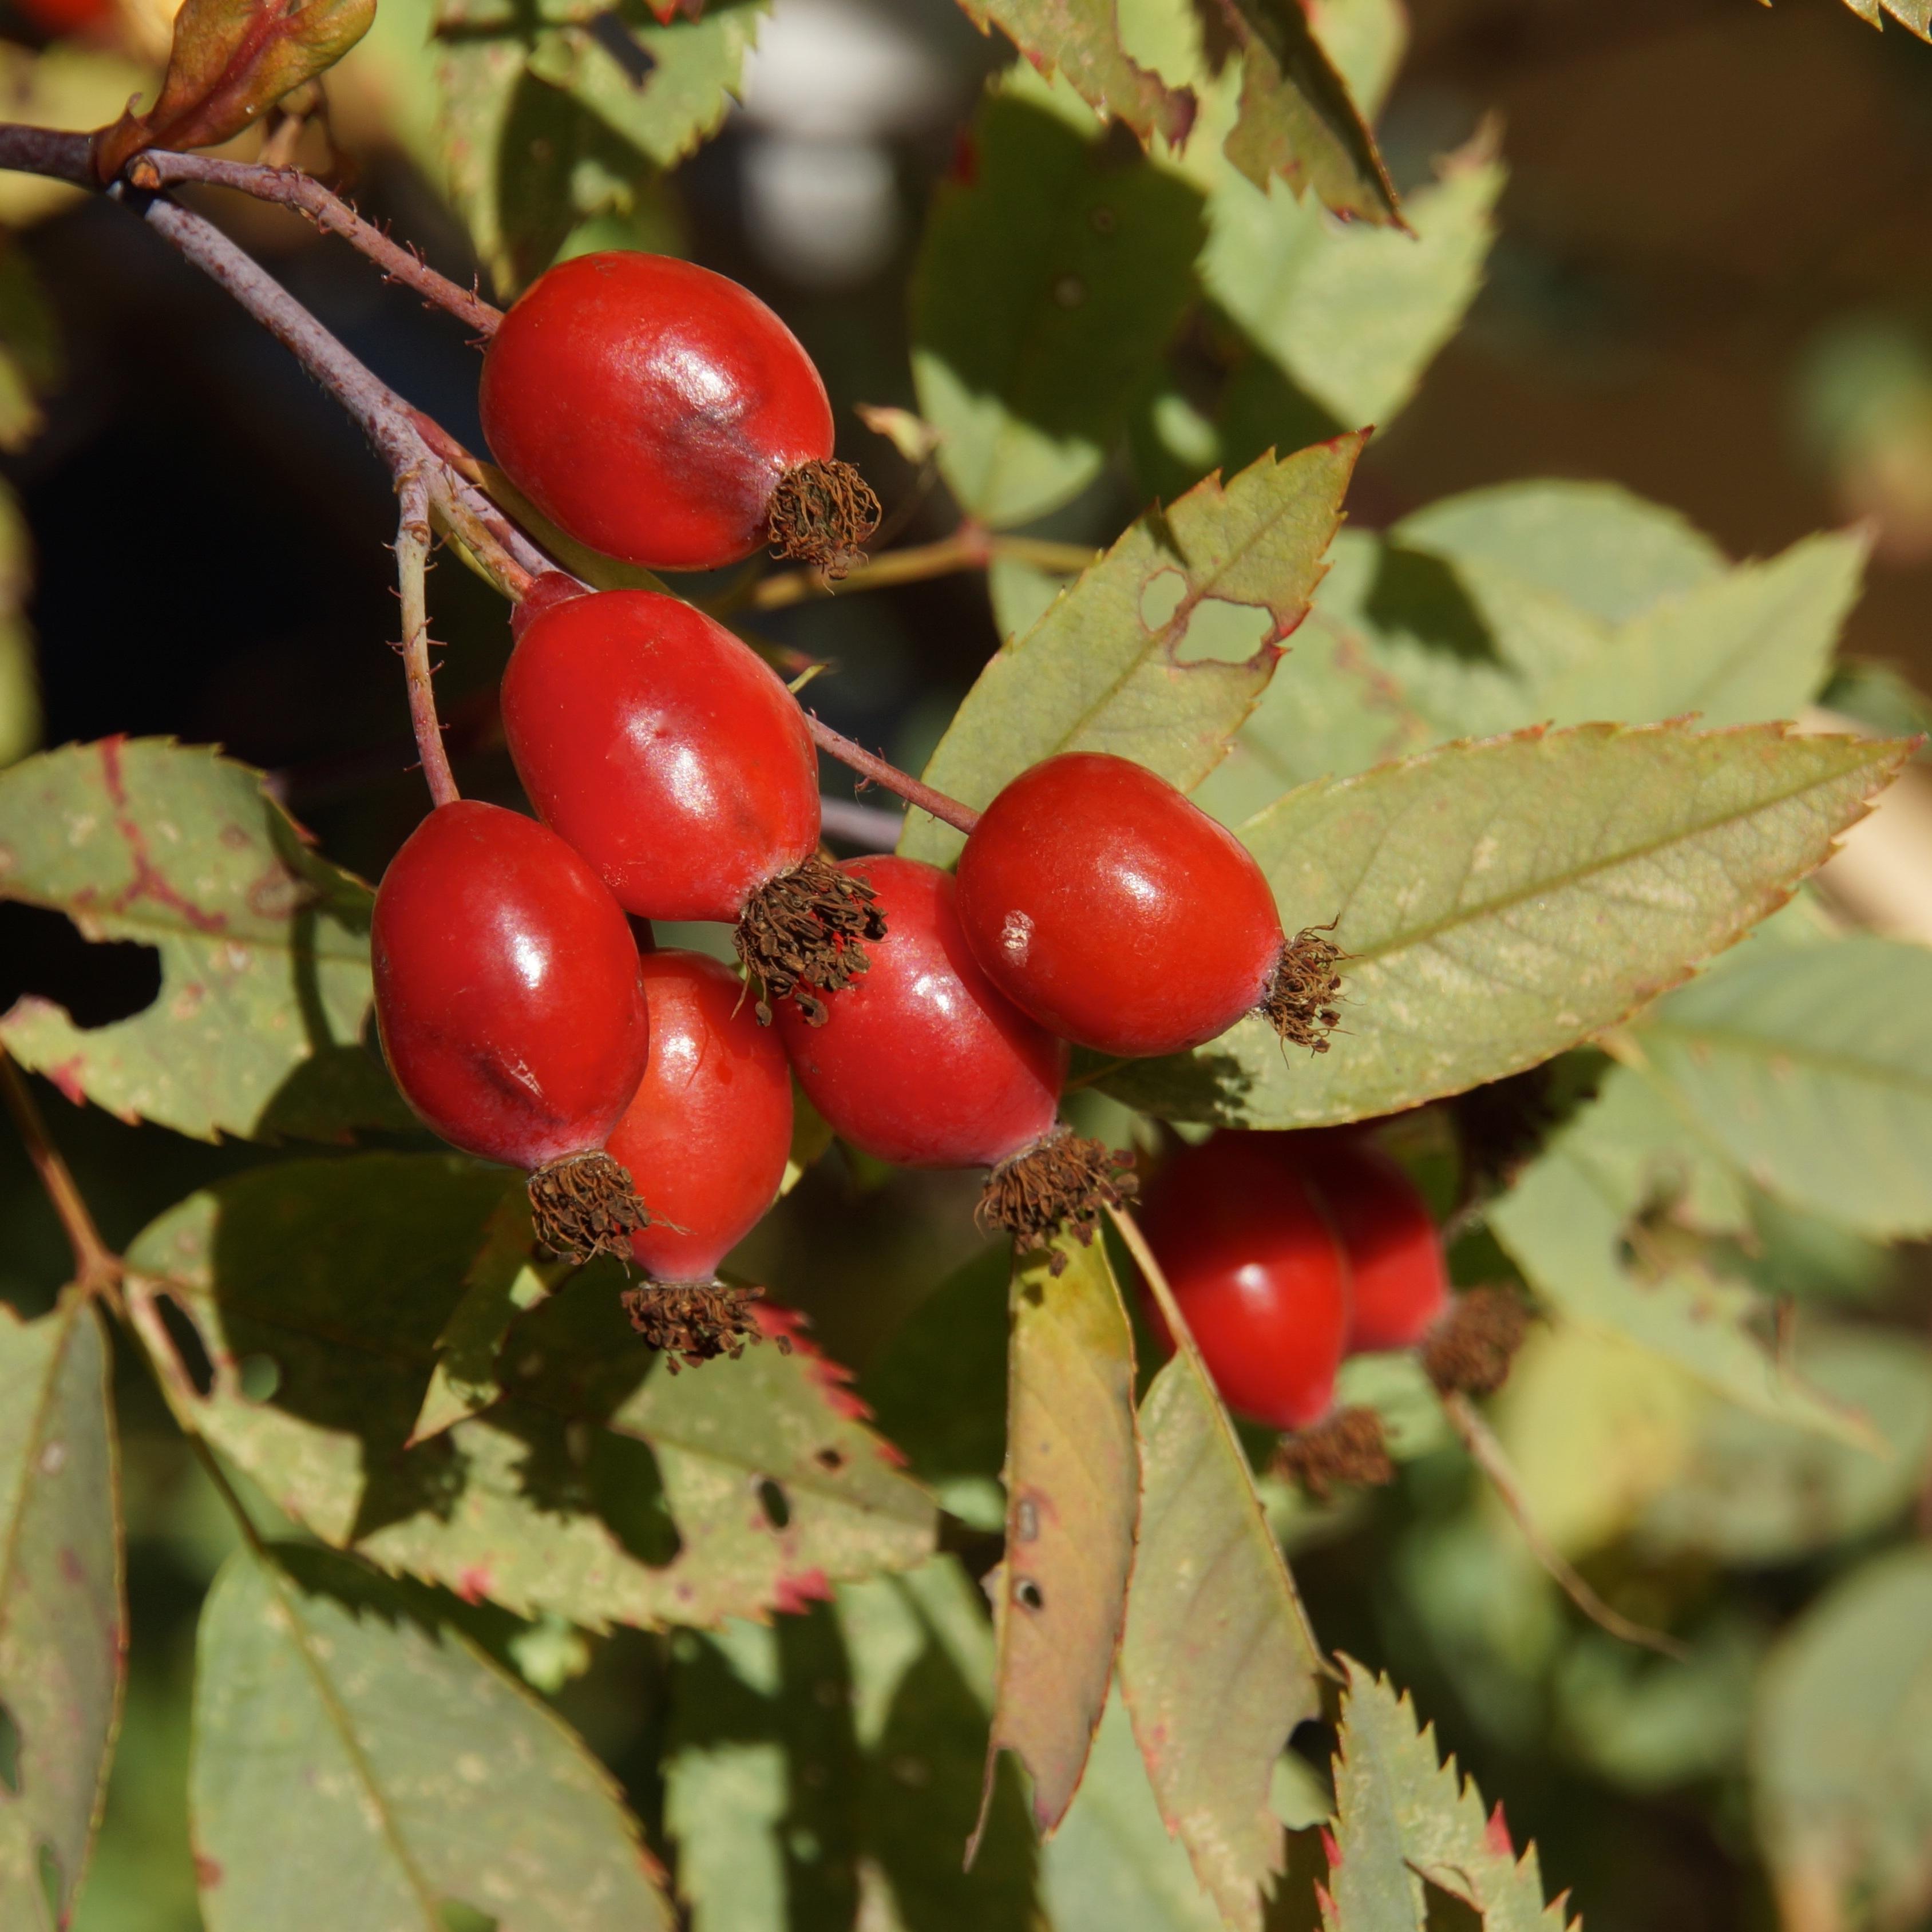 Free Images Tree Branch Fruit Berry Leaf Flower Food